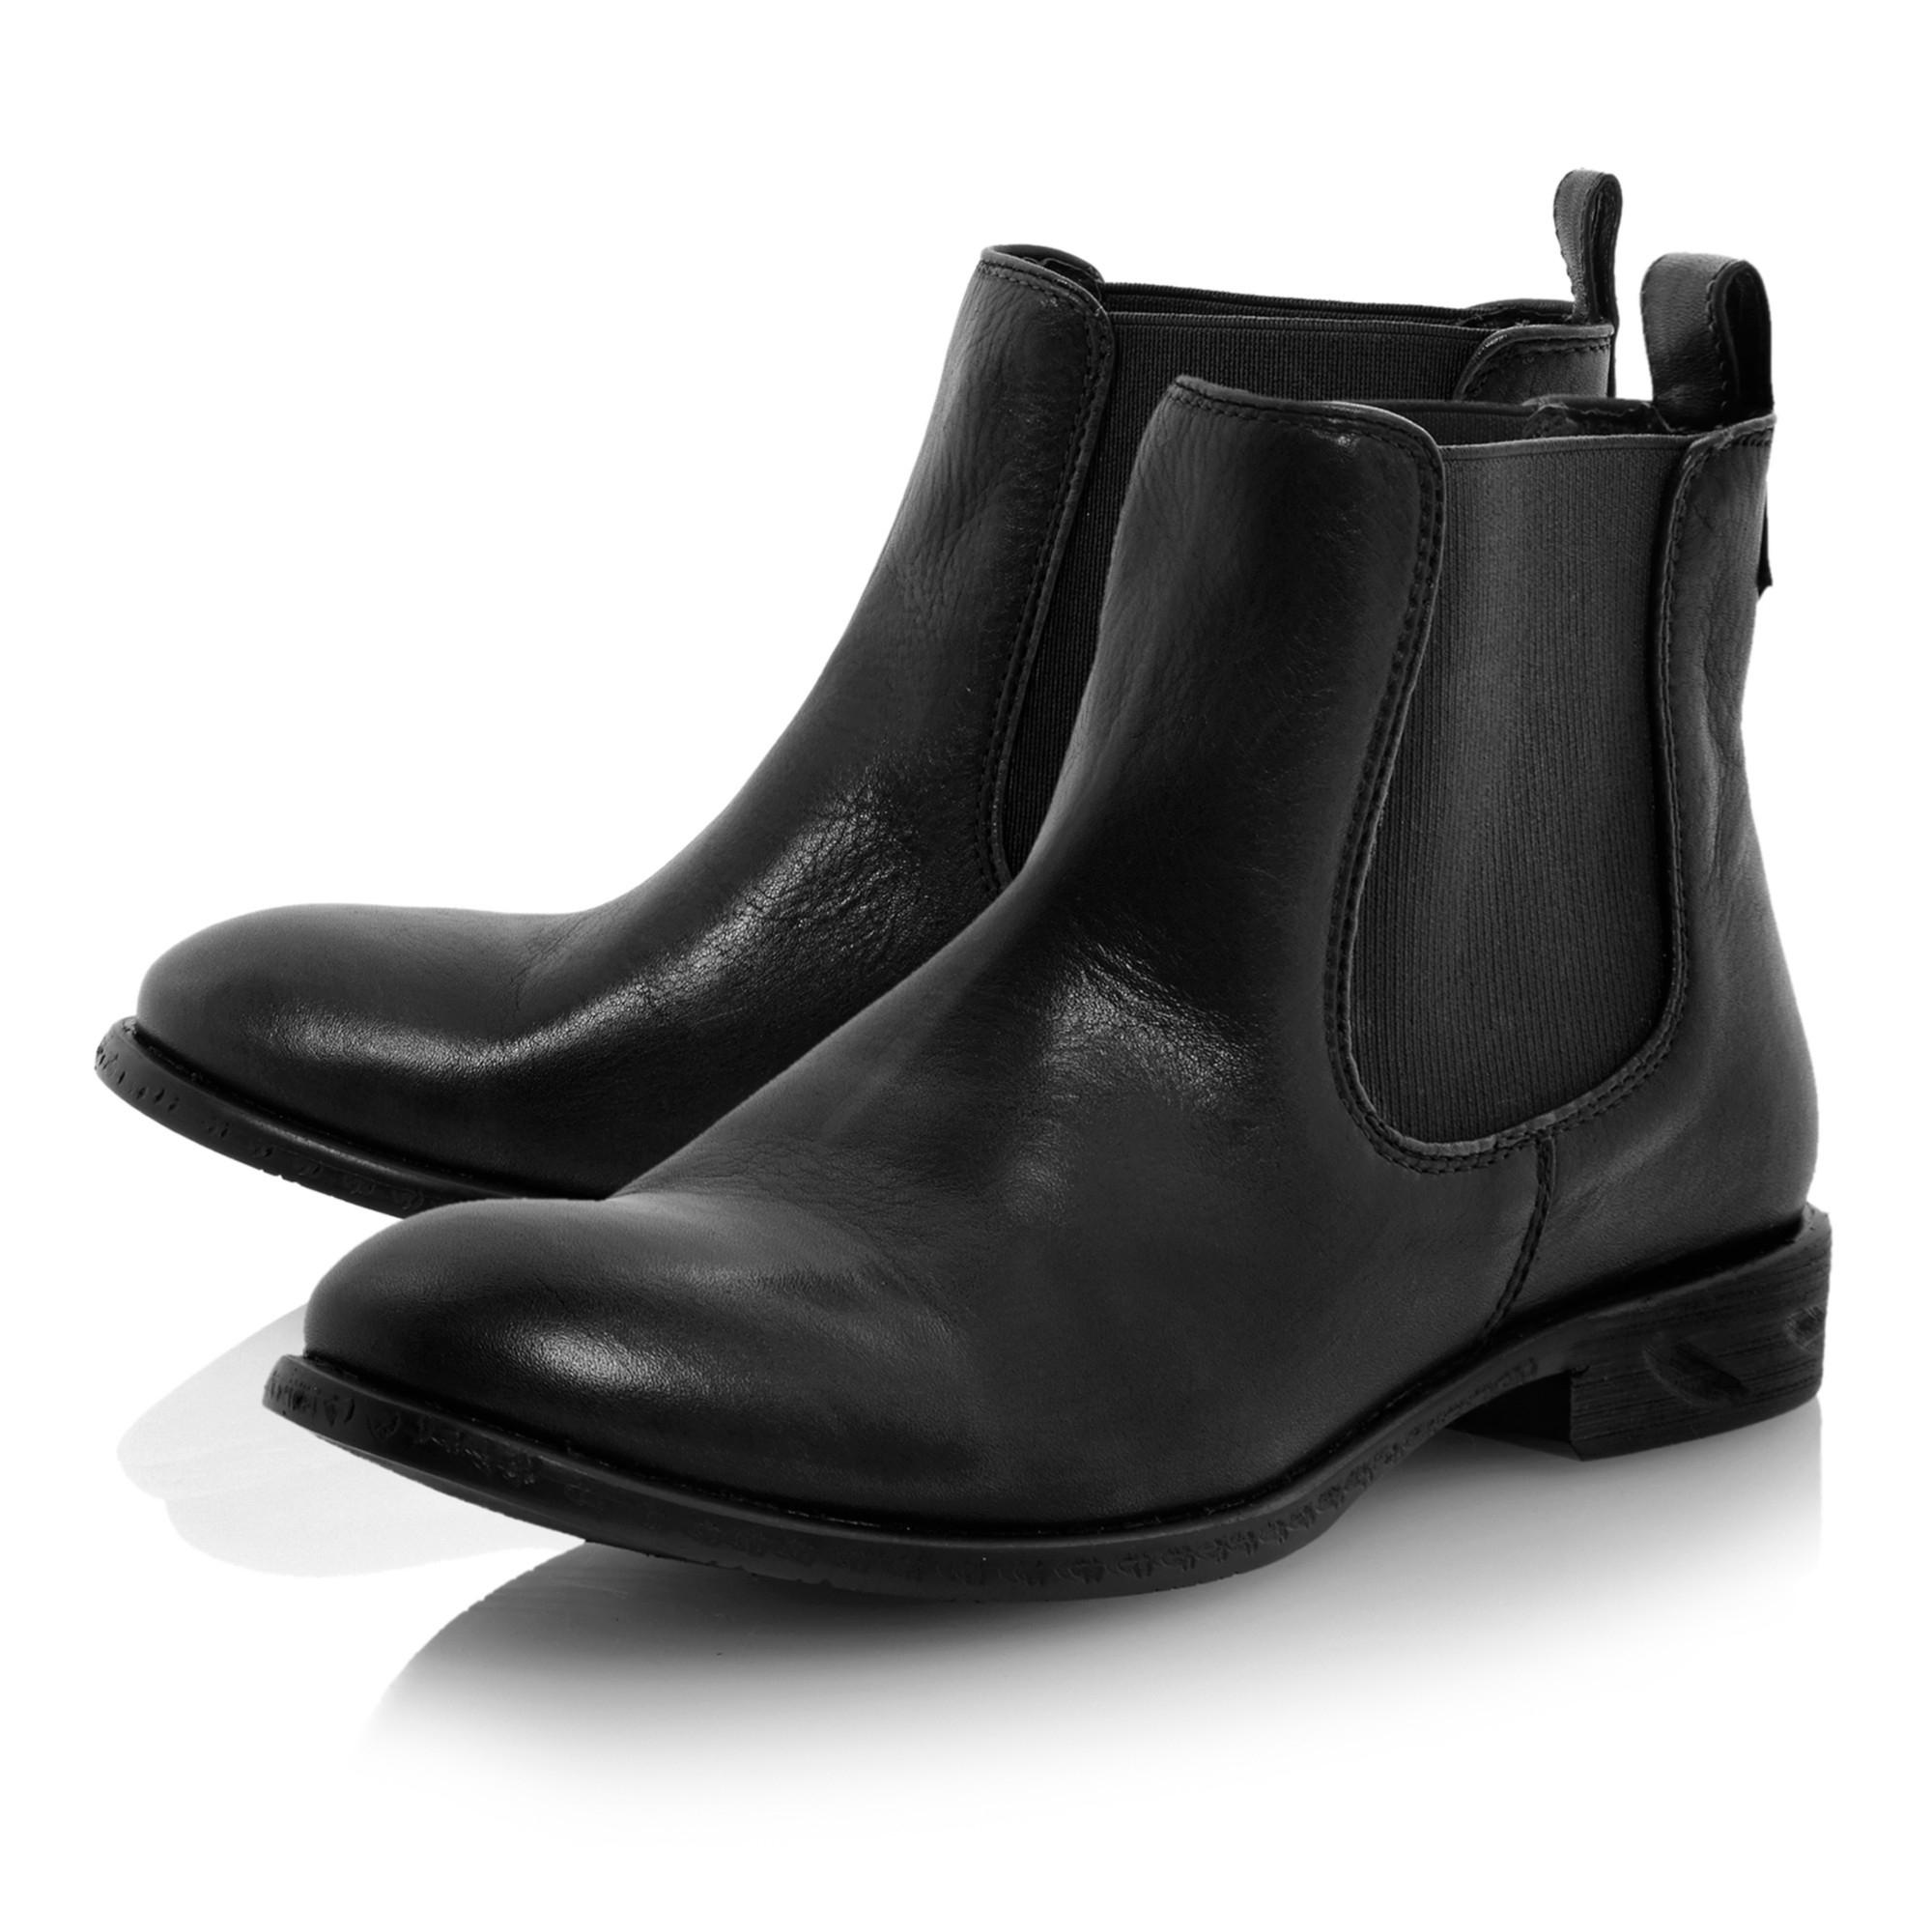 steve madden treacy leather almond toe flat boots in black